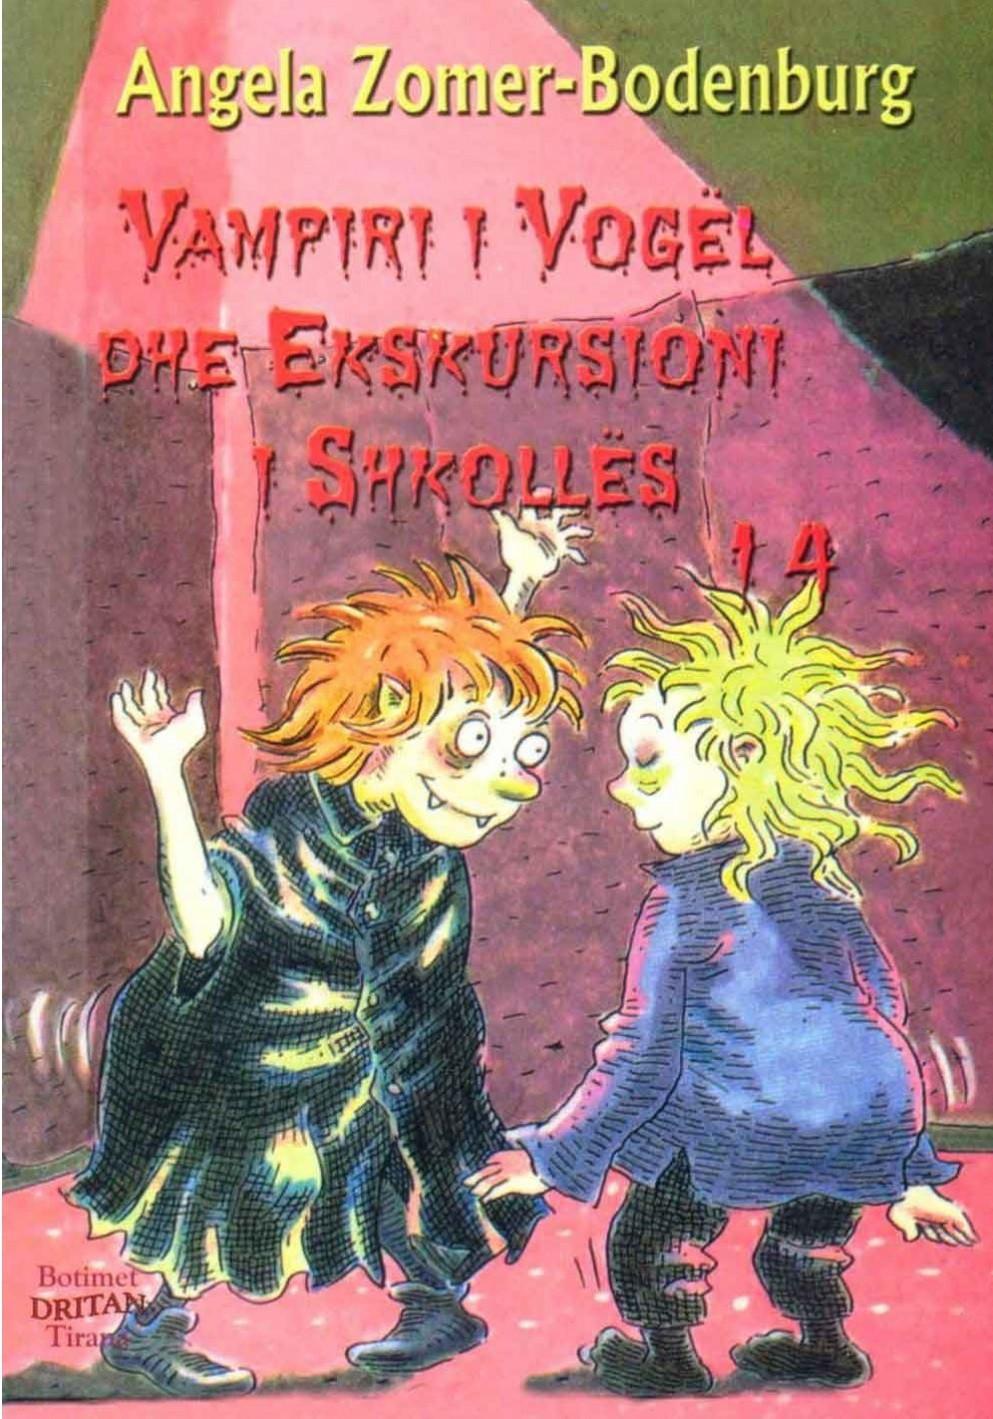 Vampiri i vogel 14 Ekskursioni i shkolles